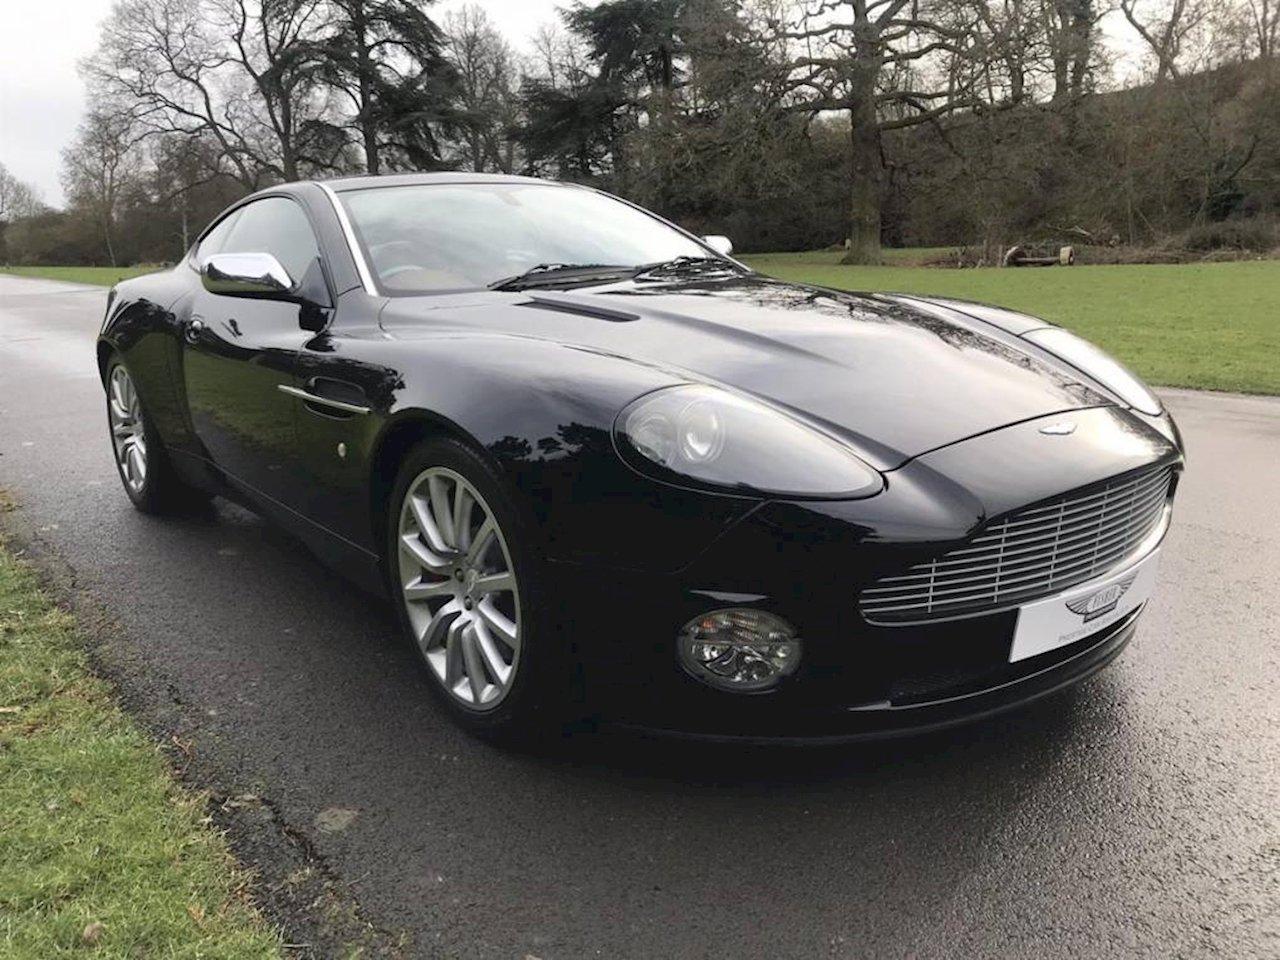 2004 Aston Martin Vanquish - 2002 - Jet Black  For Sale (picture 1 of 5)